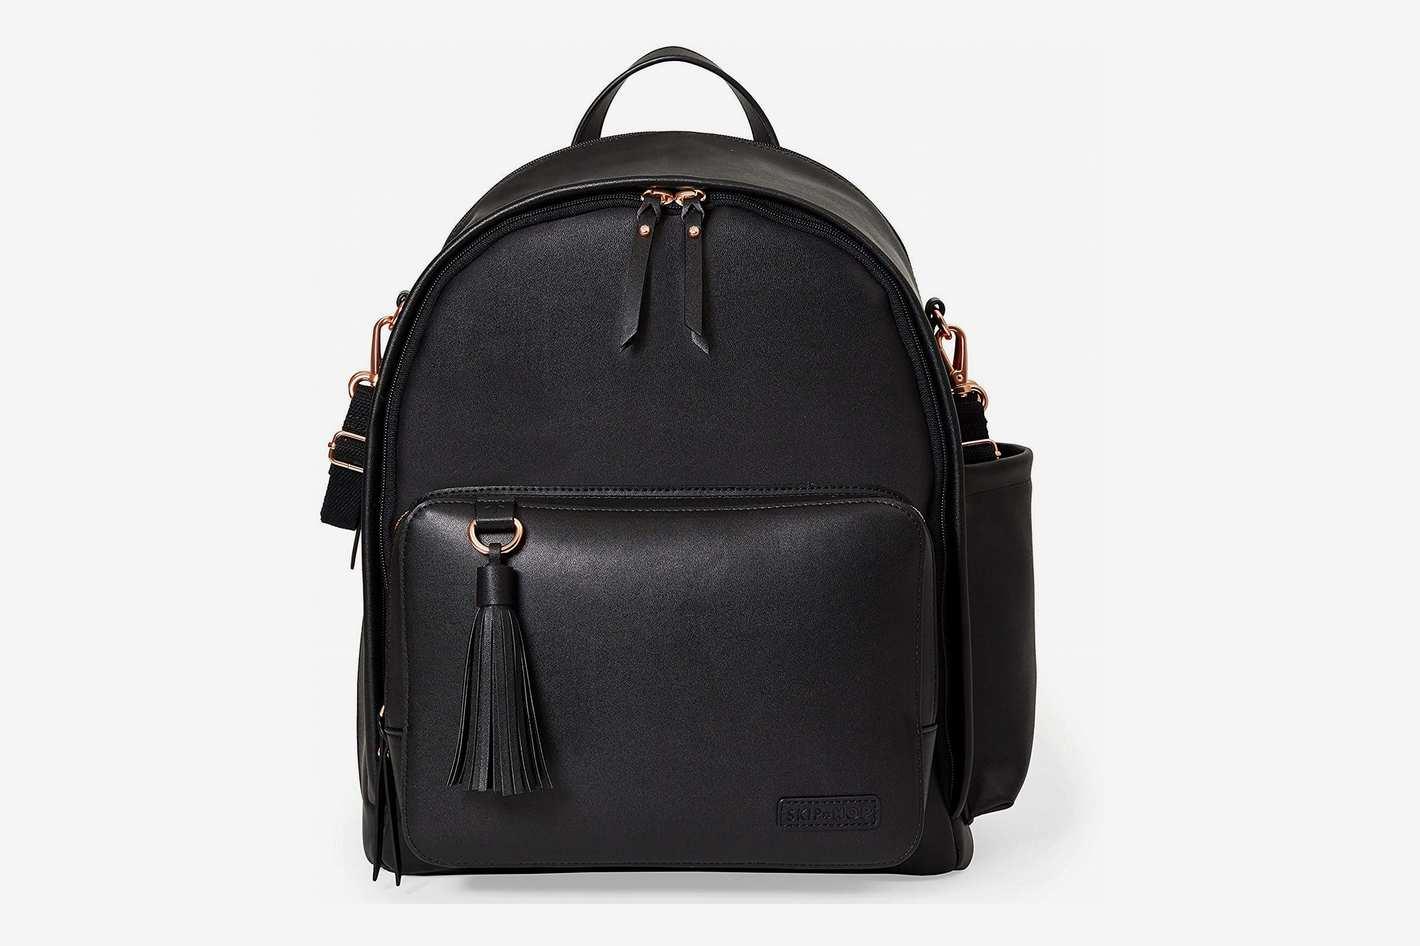 Skip Hop Greenwich Vegan Leather Diaper Bag Backpack